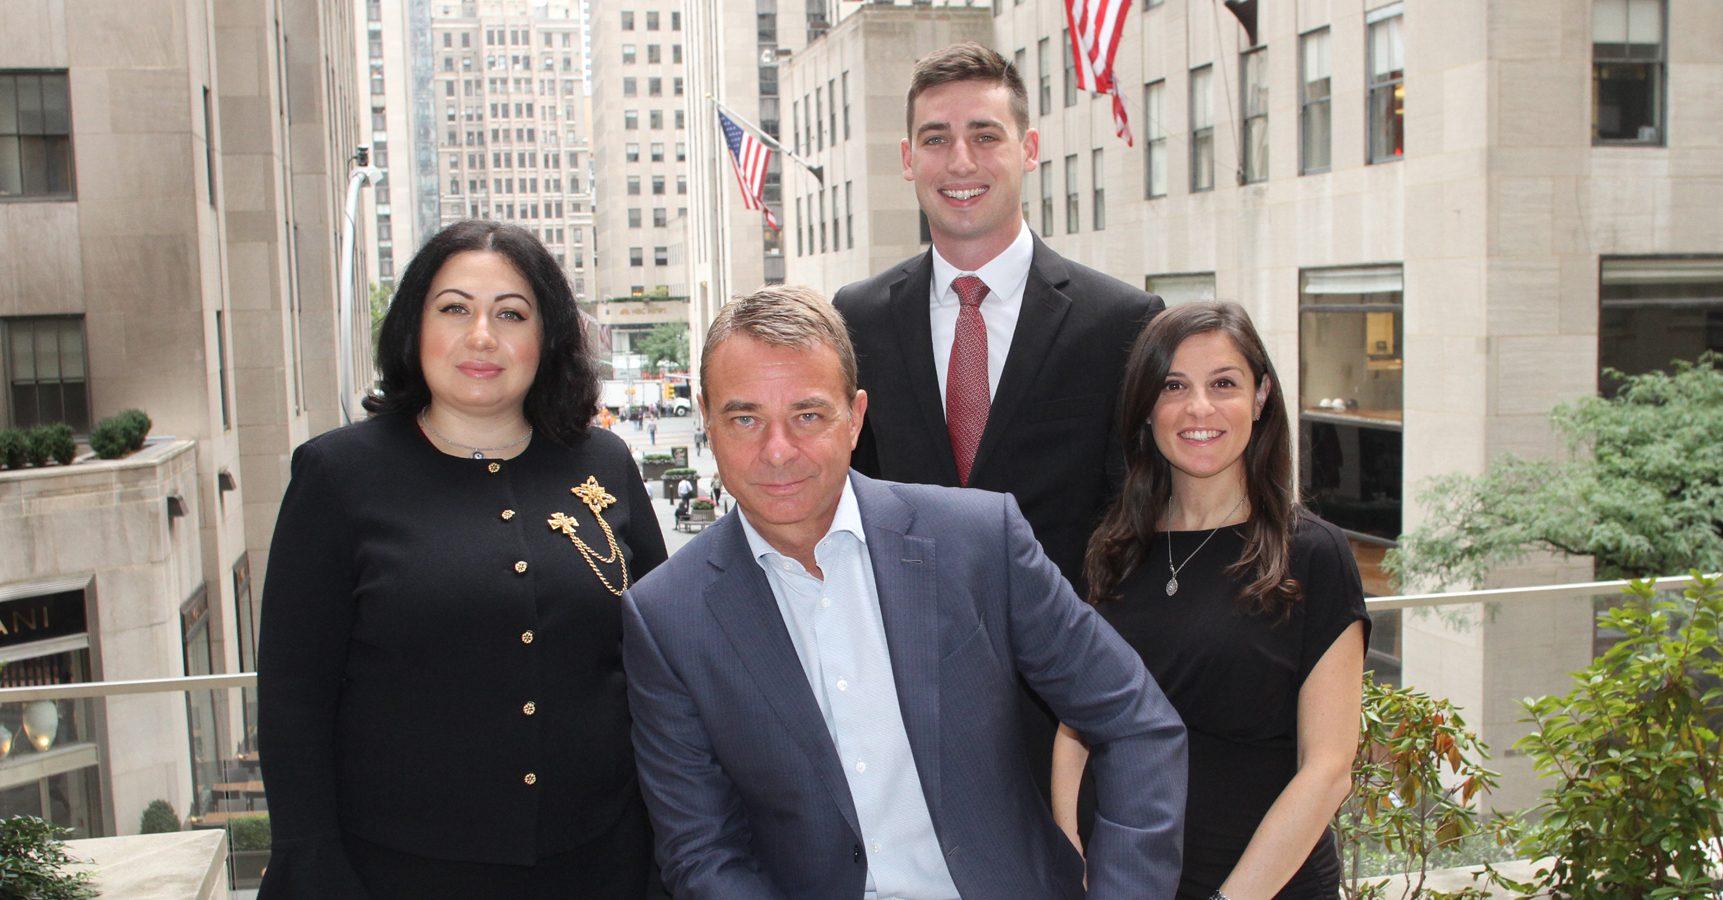 Frisk FIFTH AVENUE FINANCIAL CENTER - NEW YORK,NY   Merrill Lynch LW-82